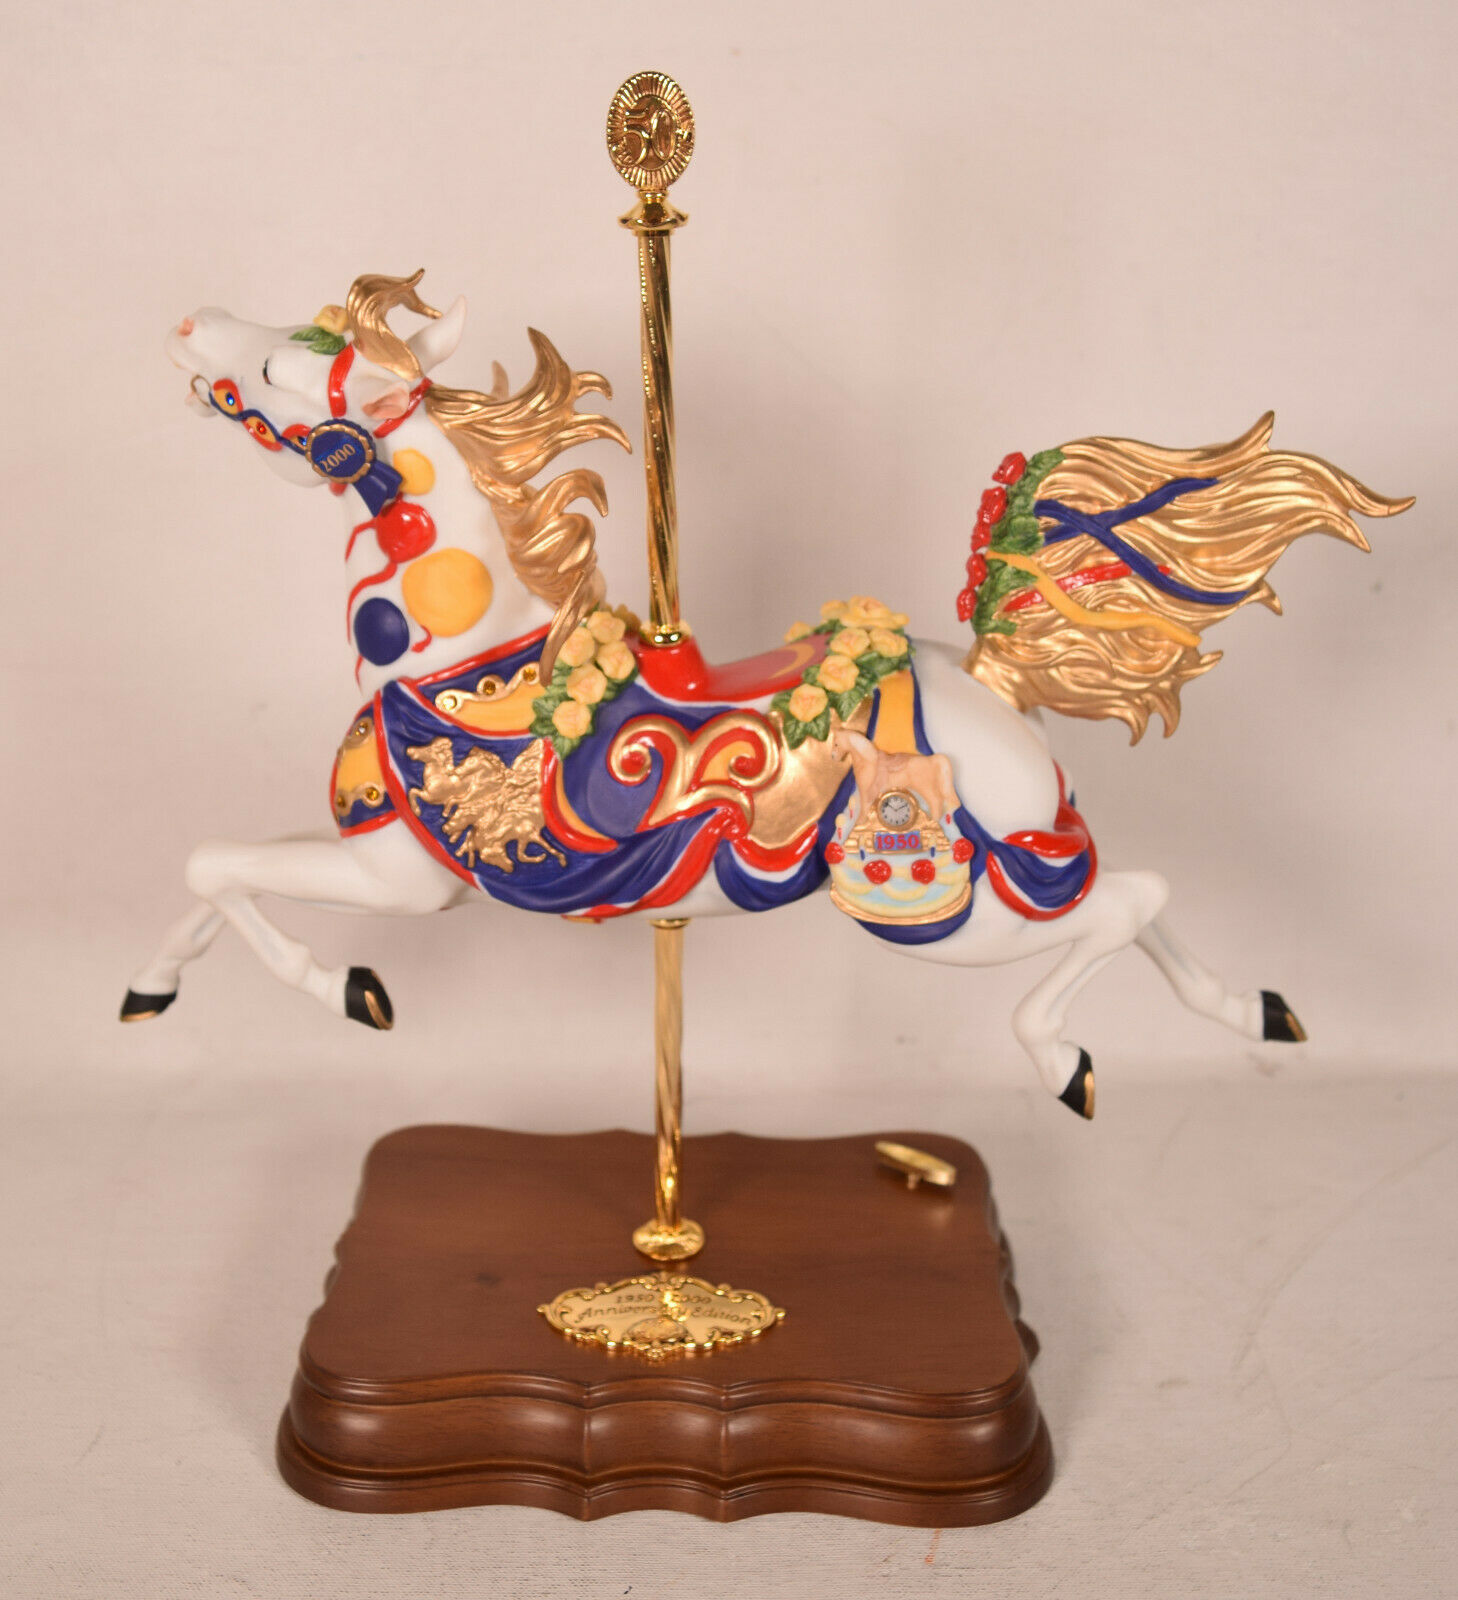 Breyer Gallery Carousel Horse w Music Box  - $128.70